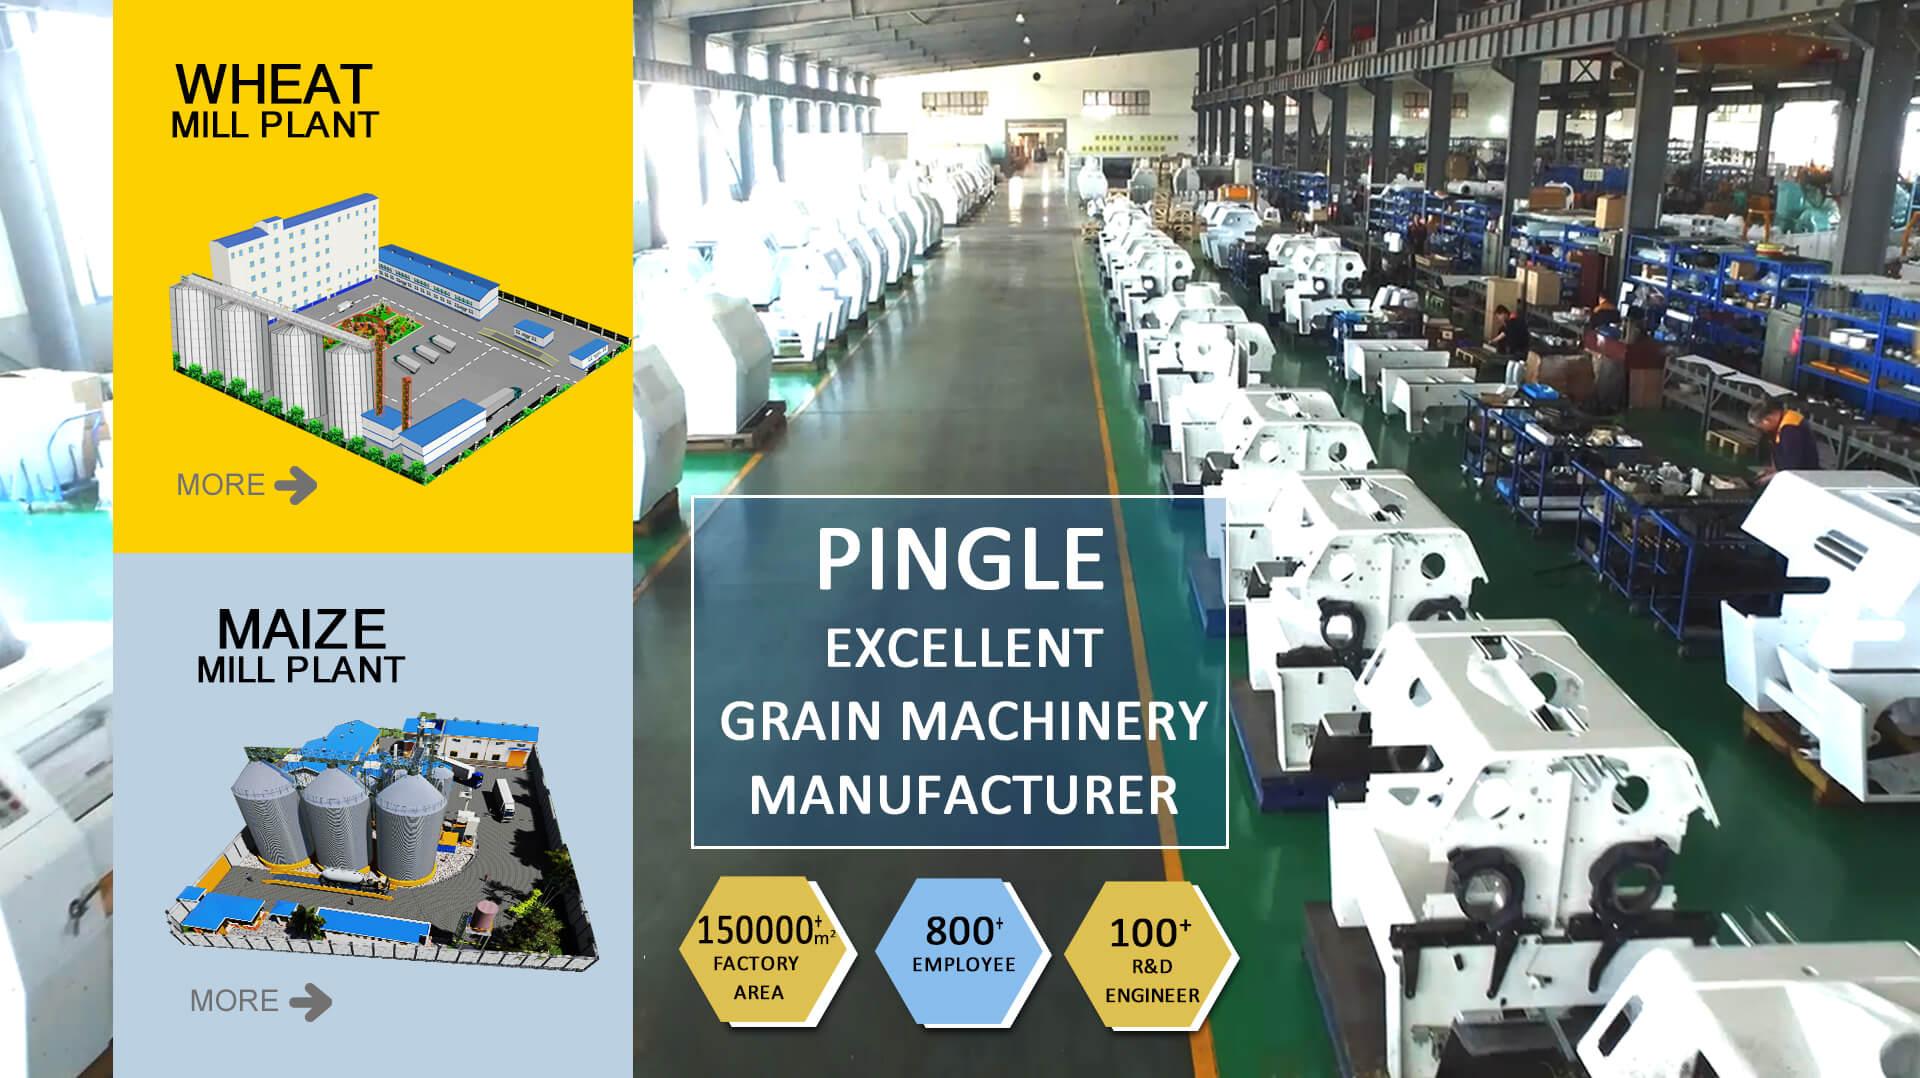 Pingle عالی دانه تولید کننده ماشین آلات